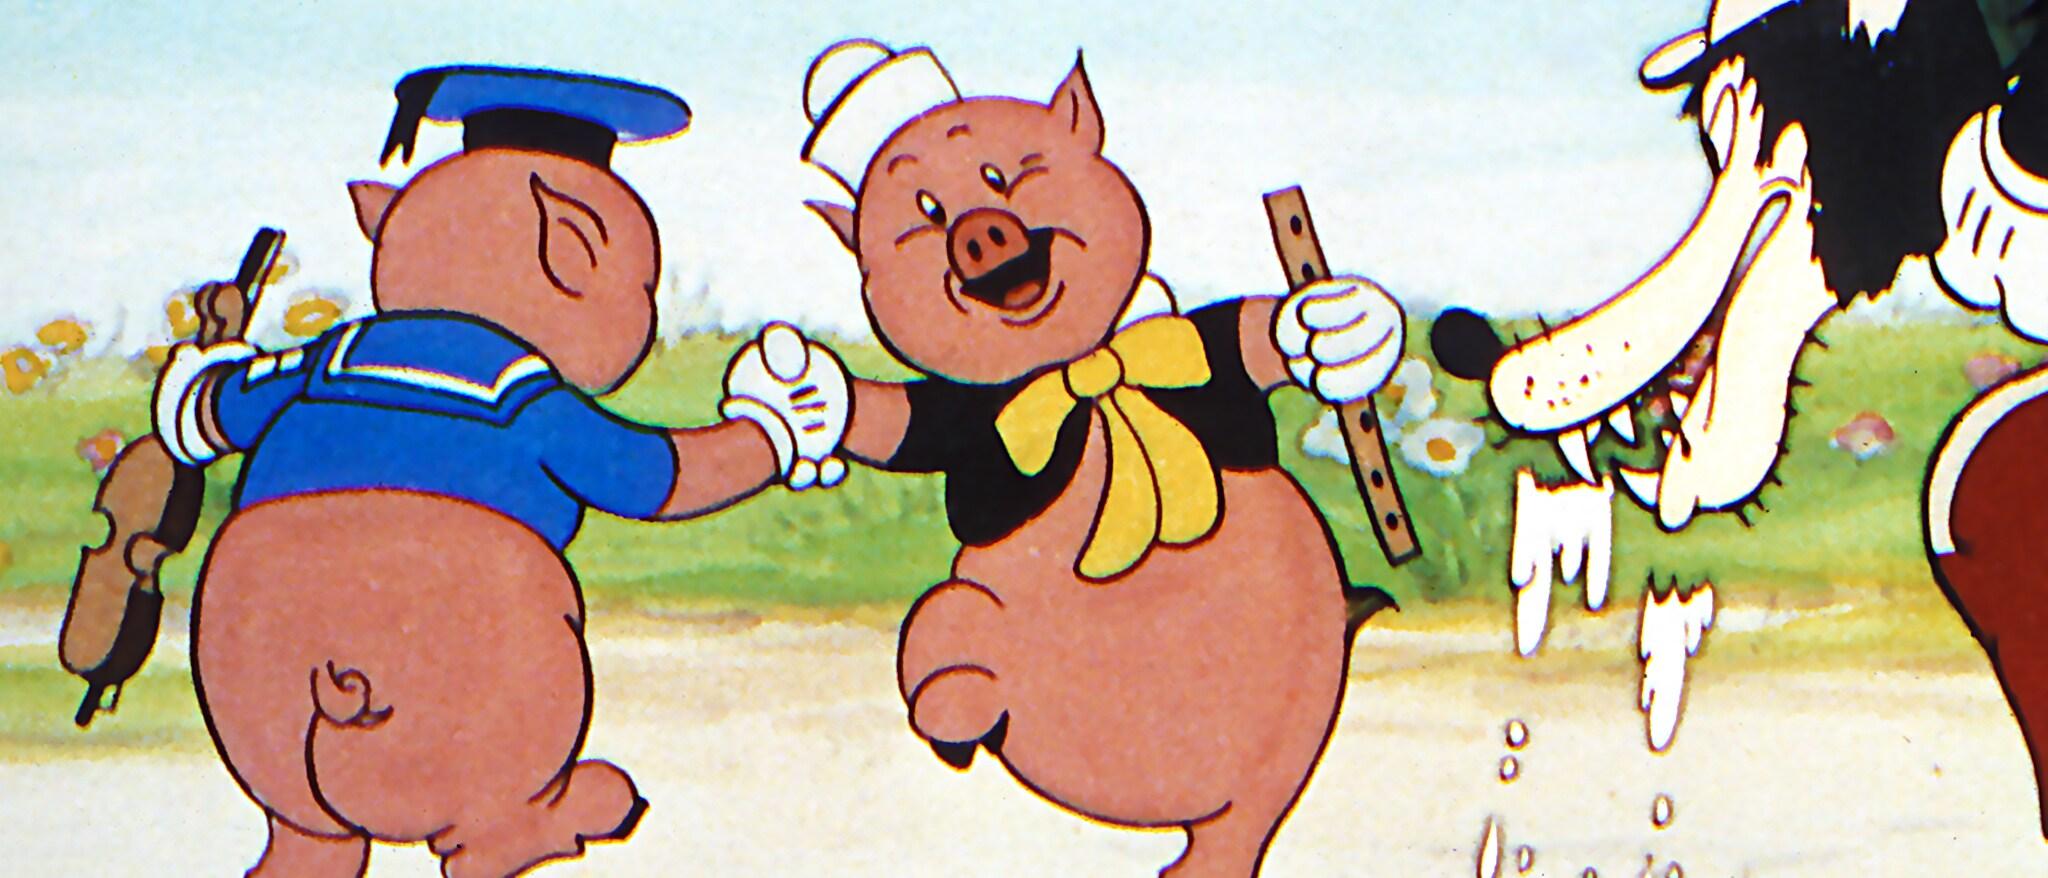 Disney Animation Collection Volume 2: Three Little Pigs Hero